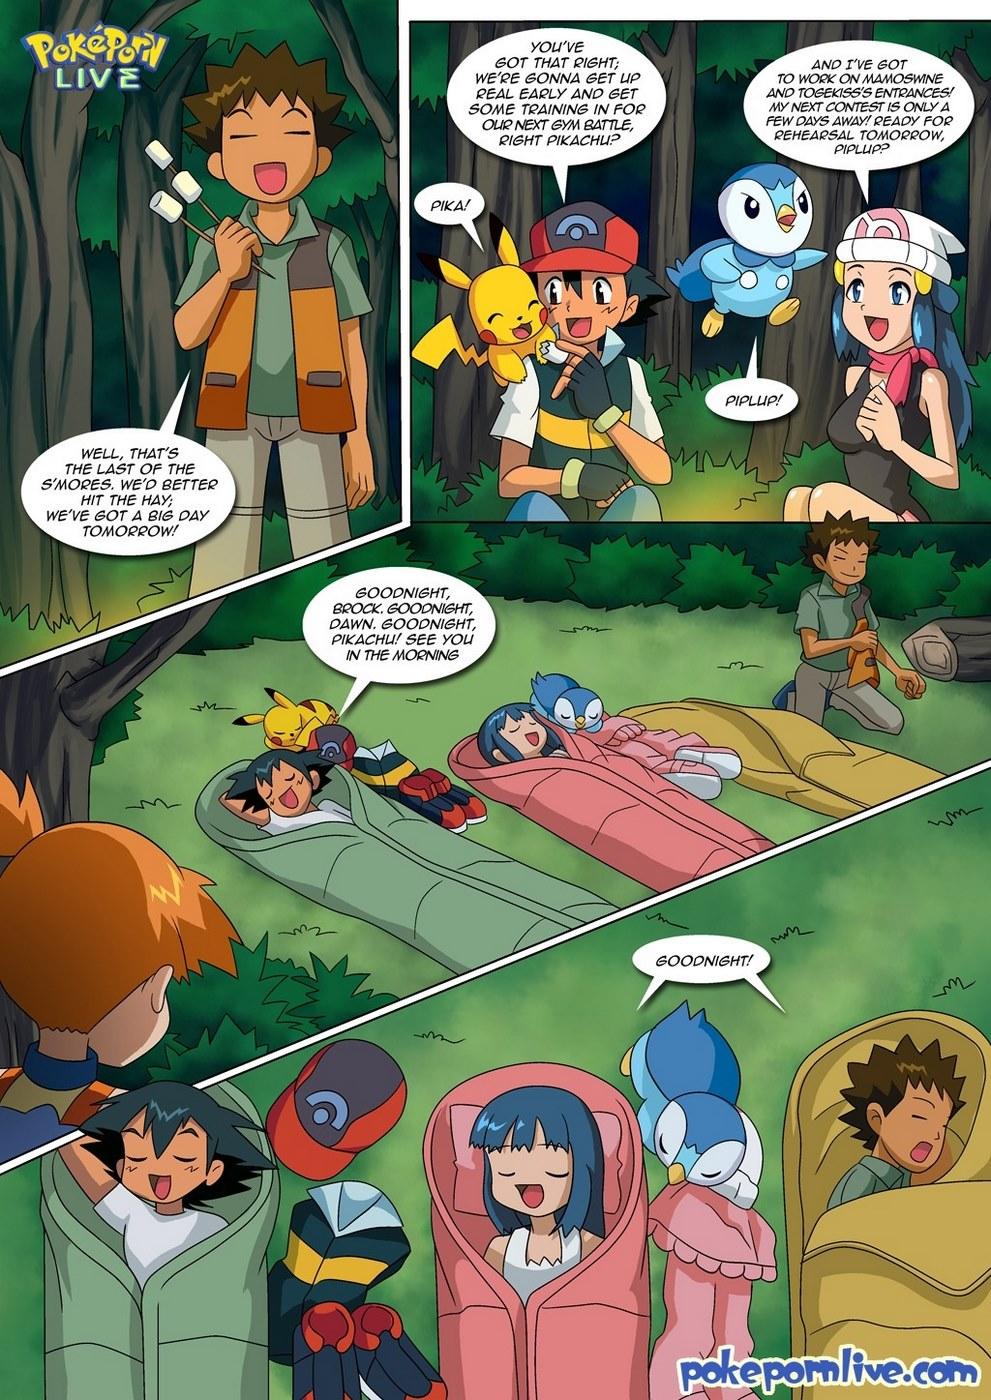 Wet Dreams (Pokemon)- Palcomix